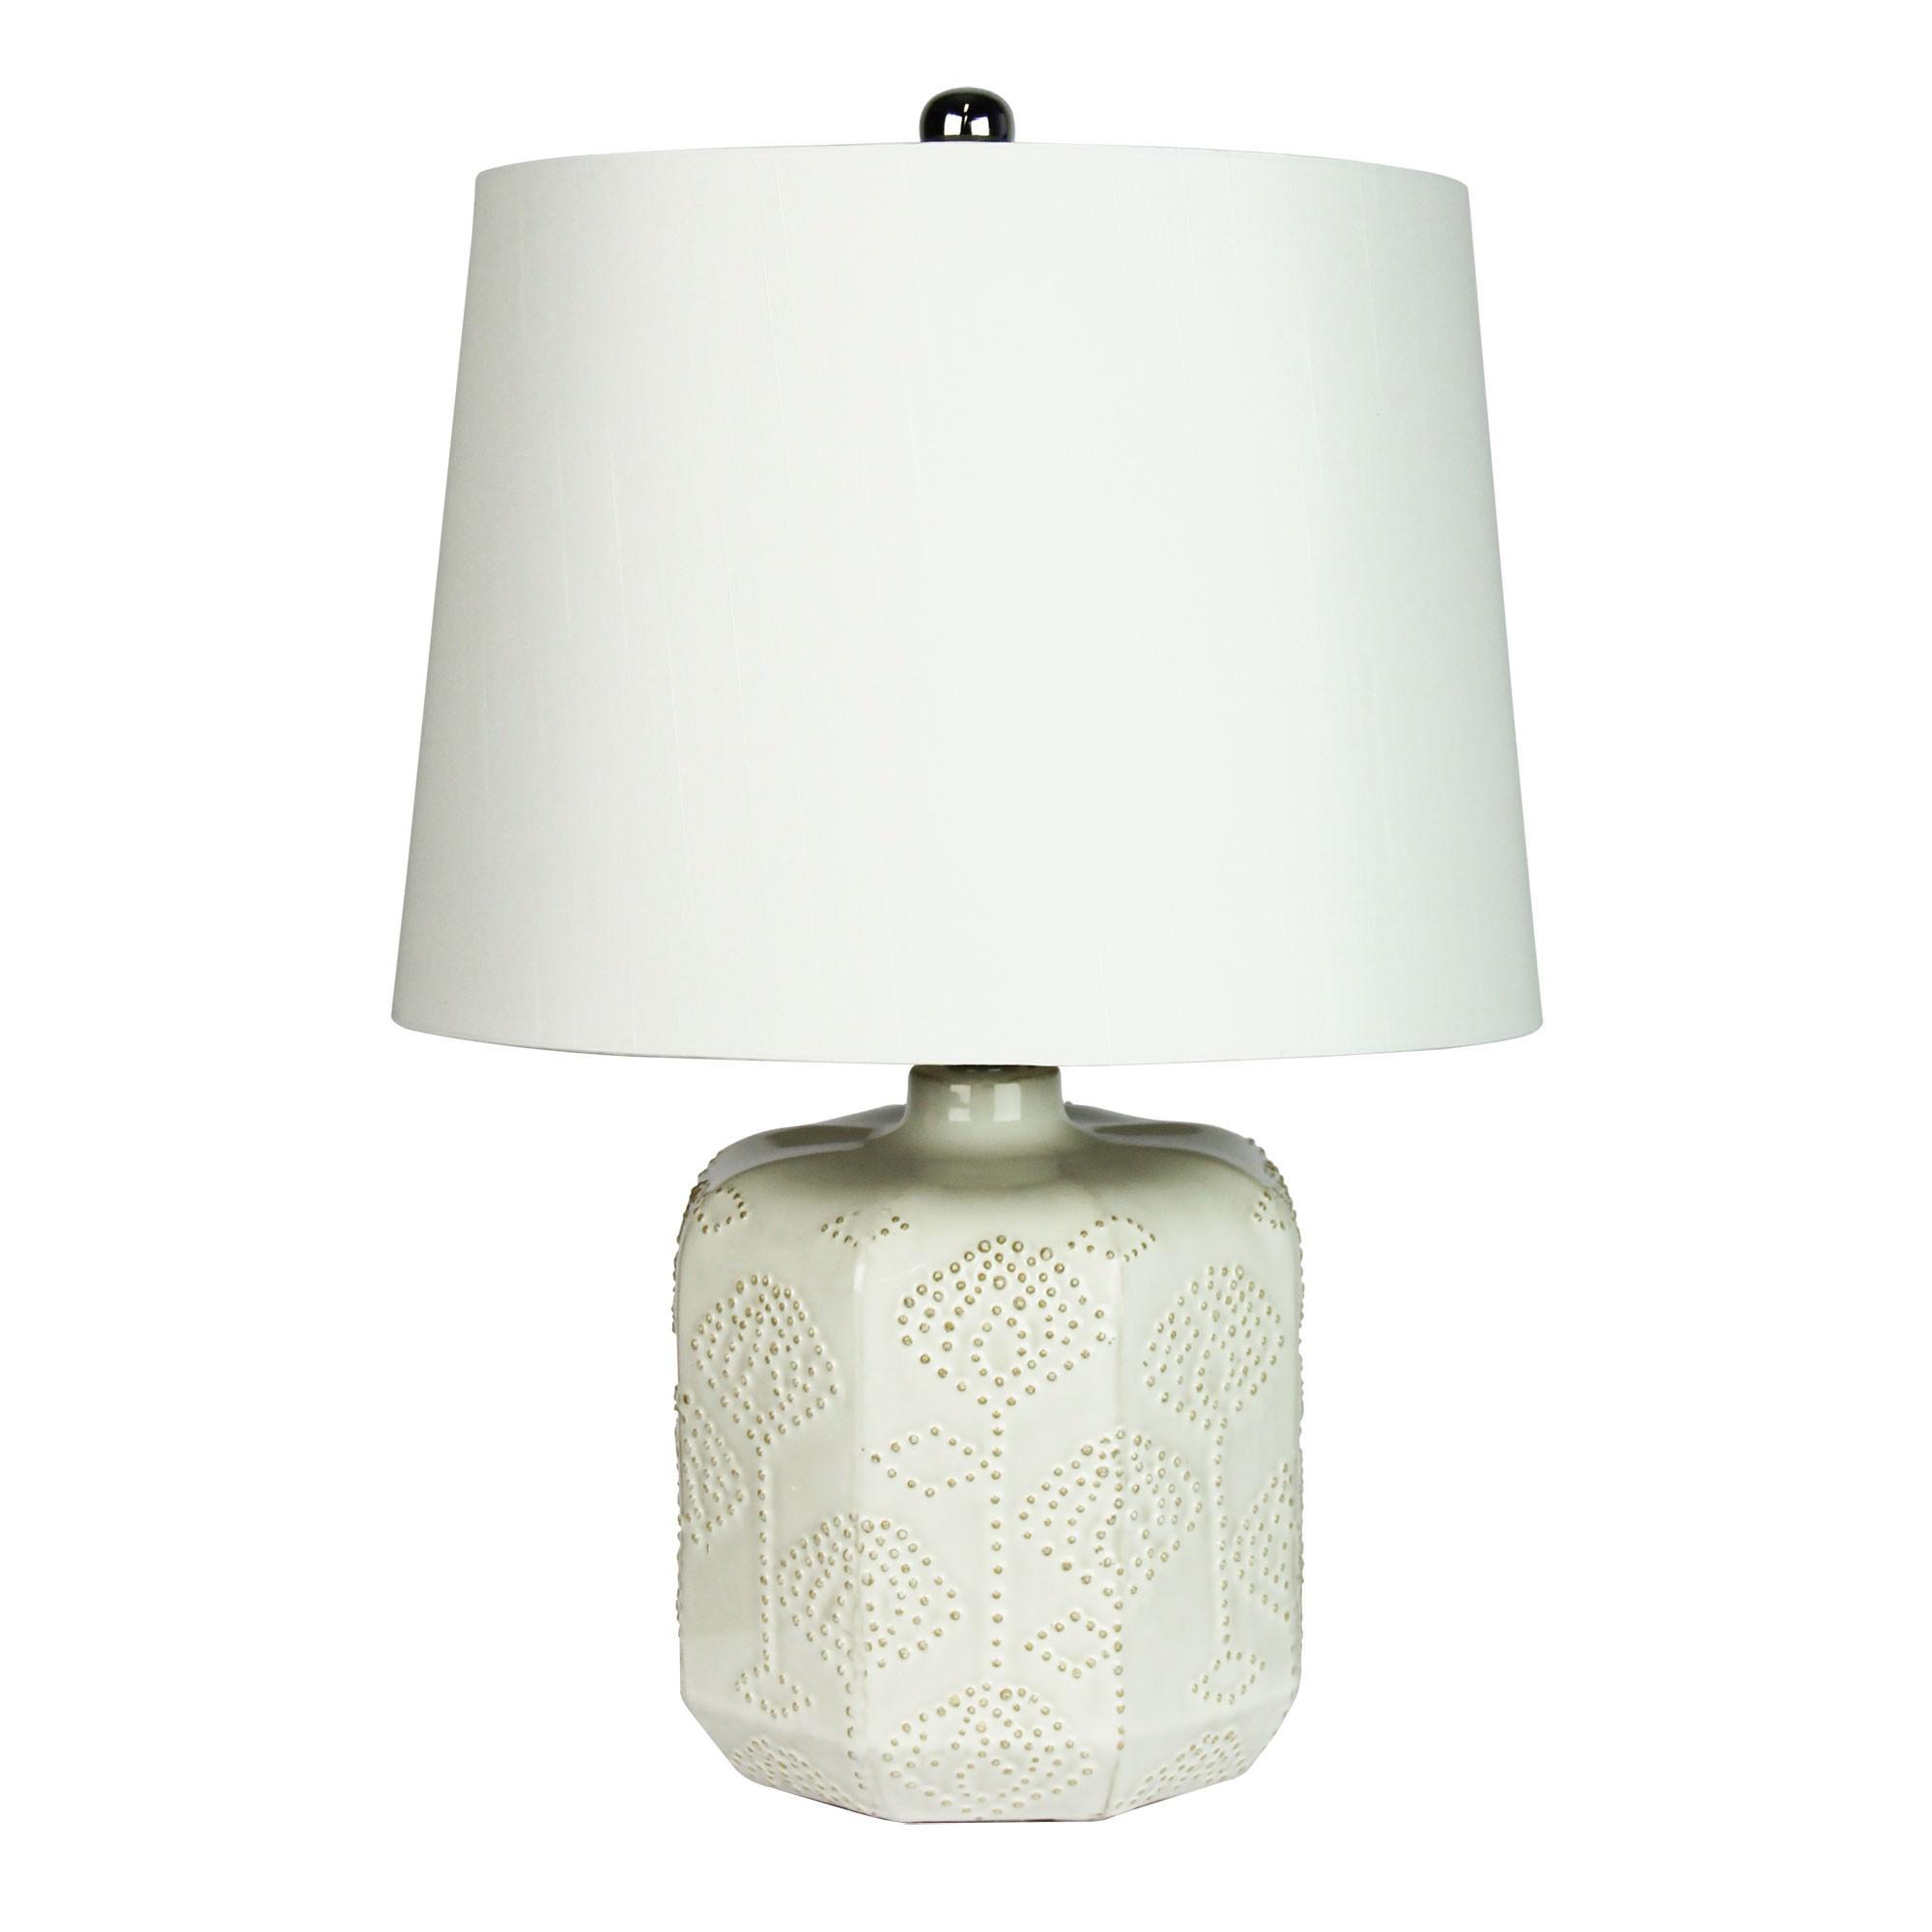 Bikki Embossed Ceramic Base Table Lamp, Antique White